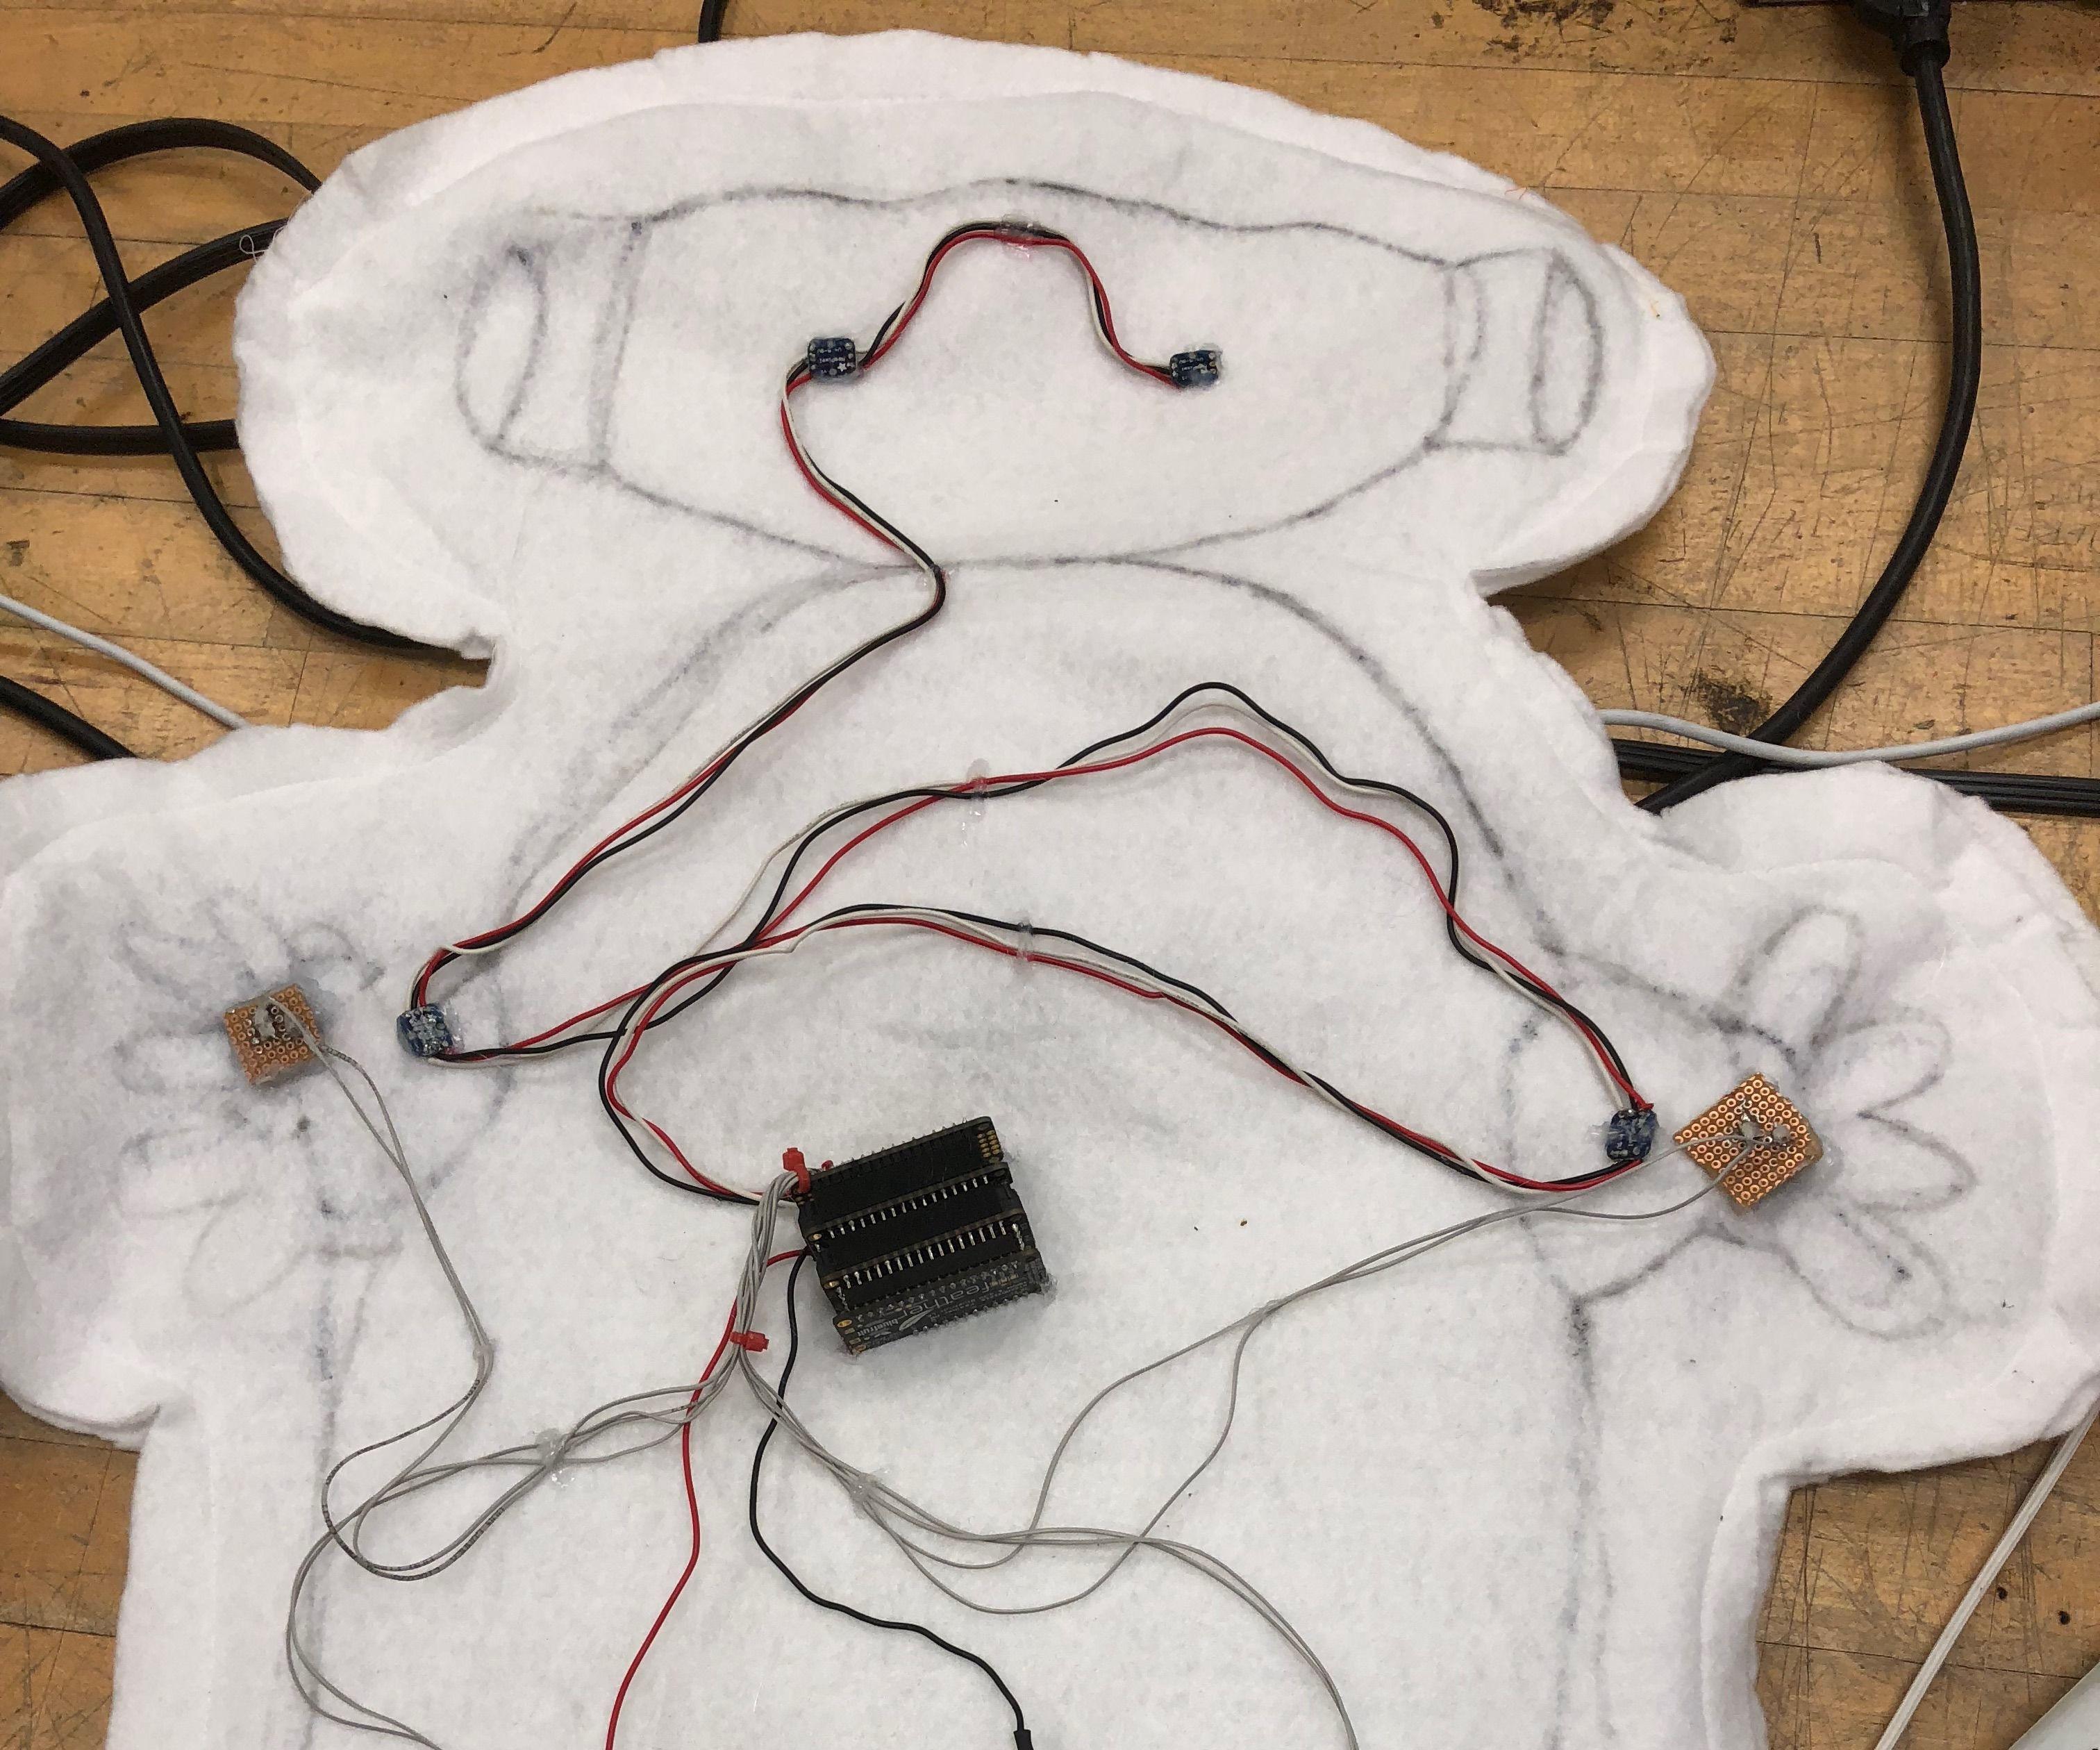 Robotic Communication Bridge for Children With Autism